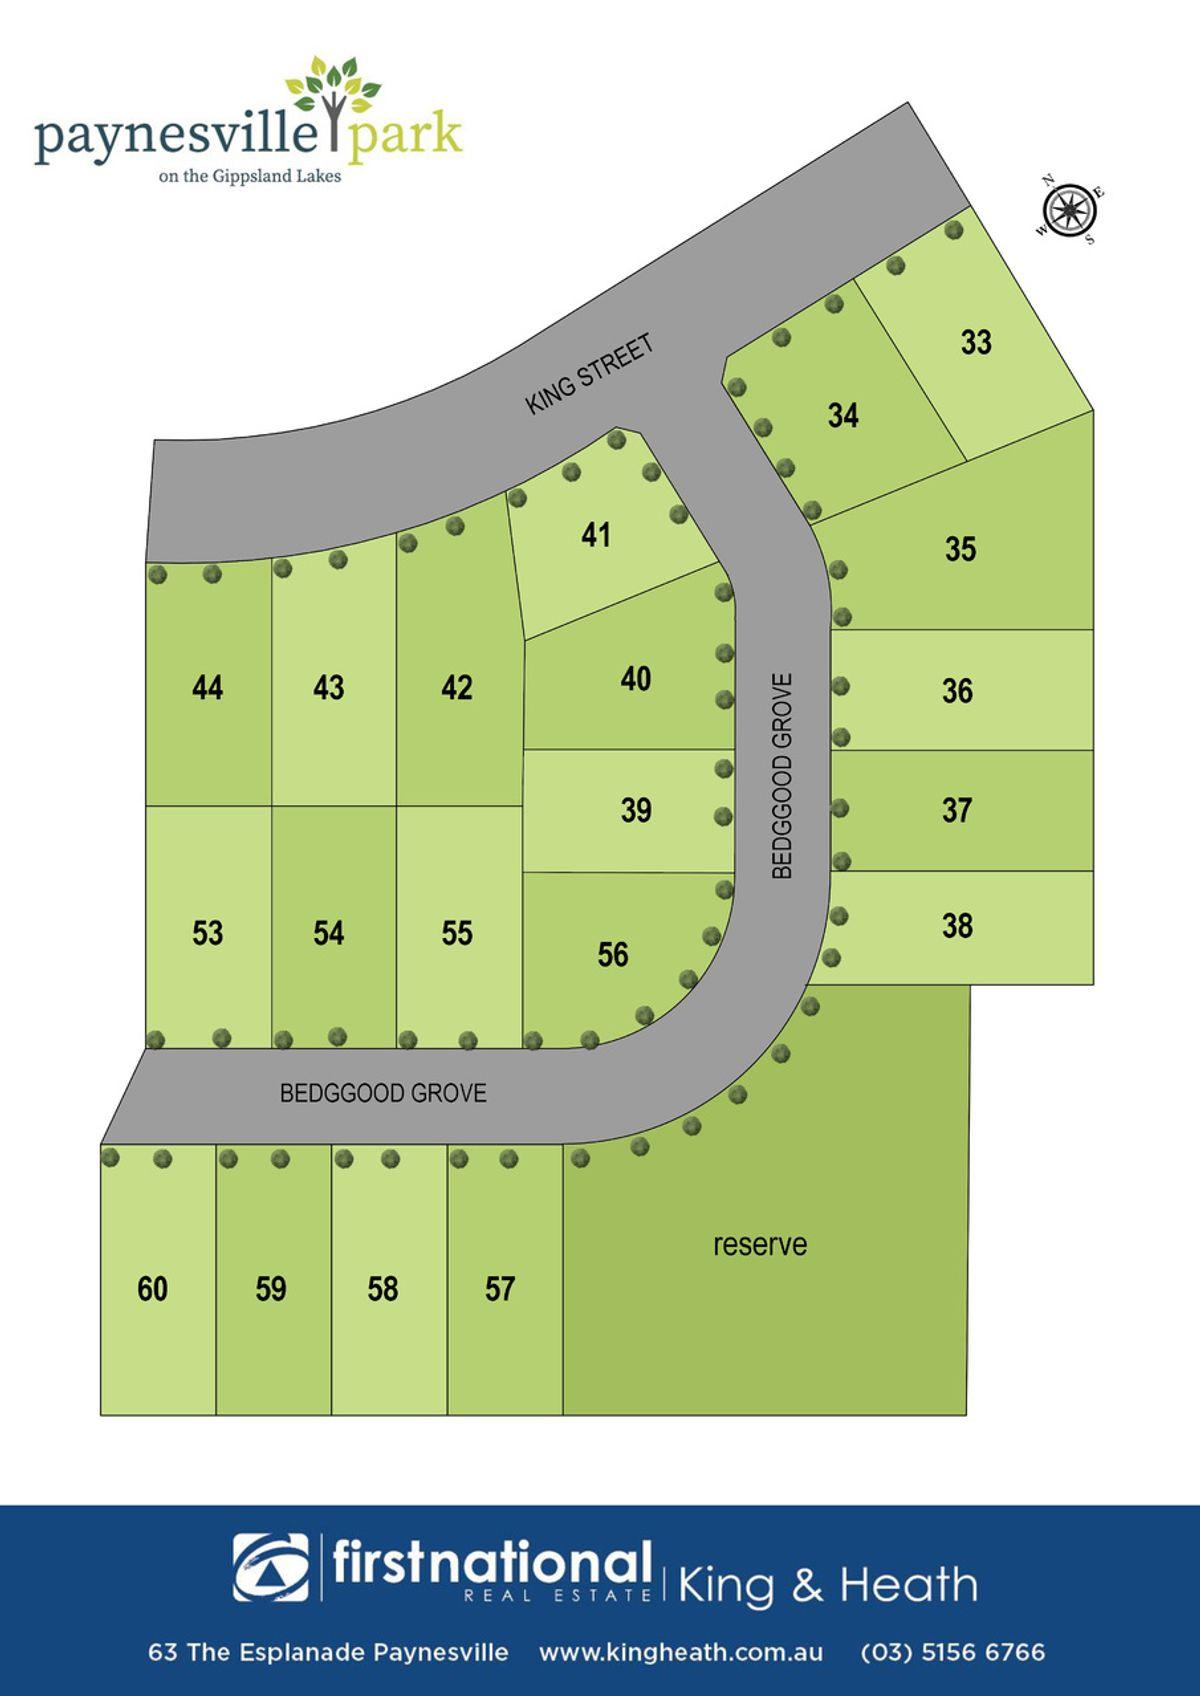 Lot 55 Bedggood Grove, Paynesville, VIC 3880